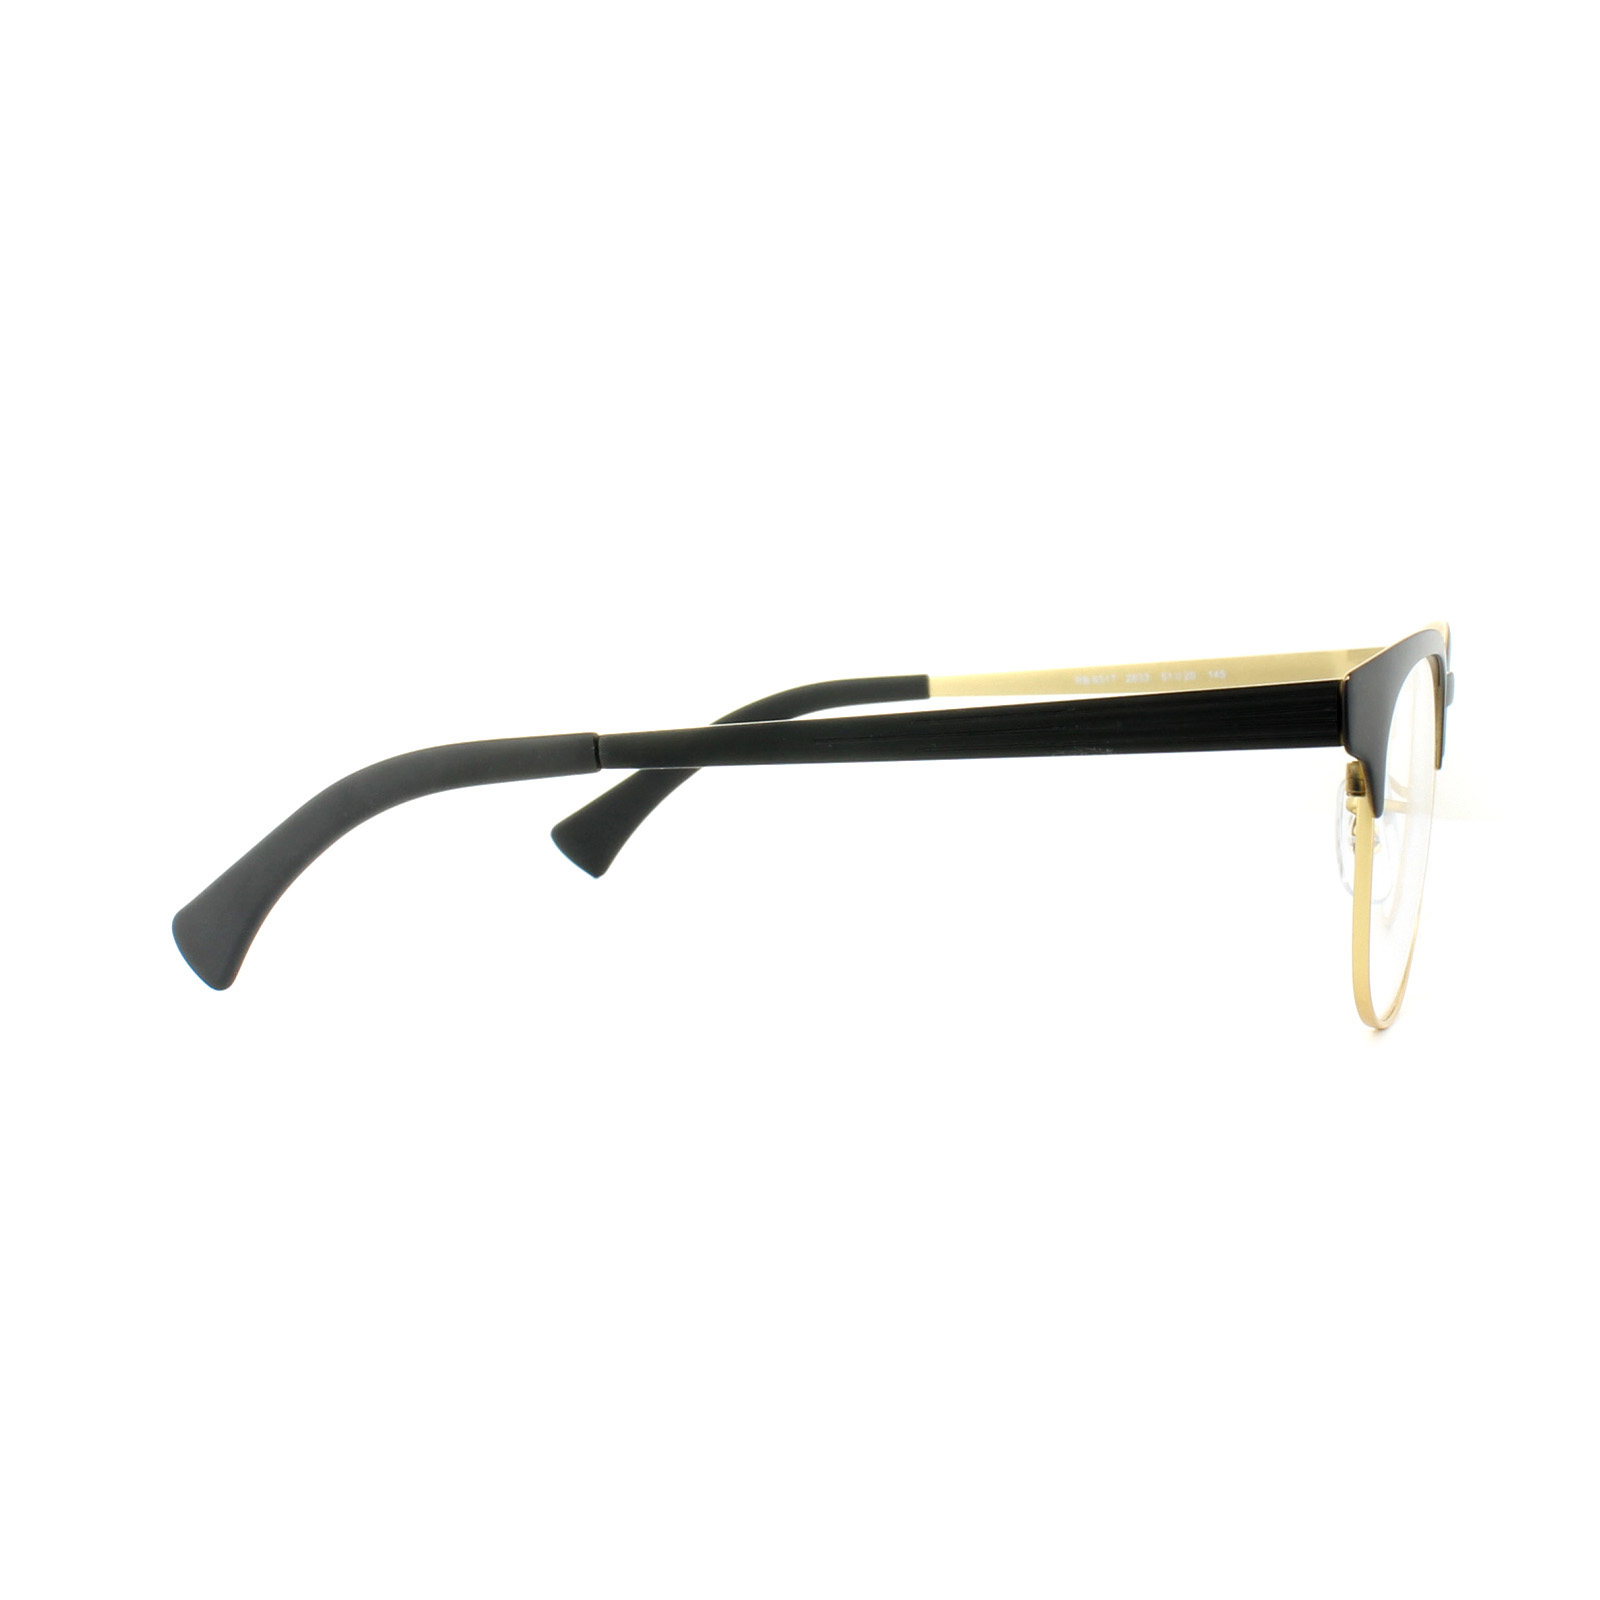 e7ab241cfef Sentinel Ray-Ban Glasses Frames 6317 2833 Top Black on Matte Gold Mens  Womens 51mm